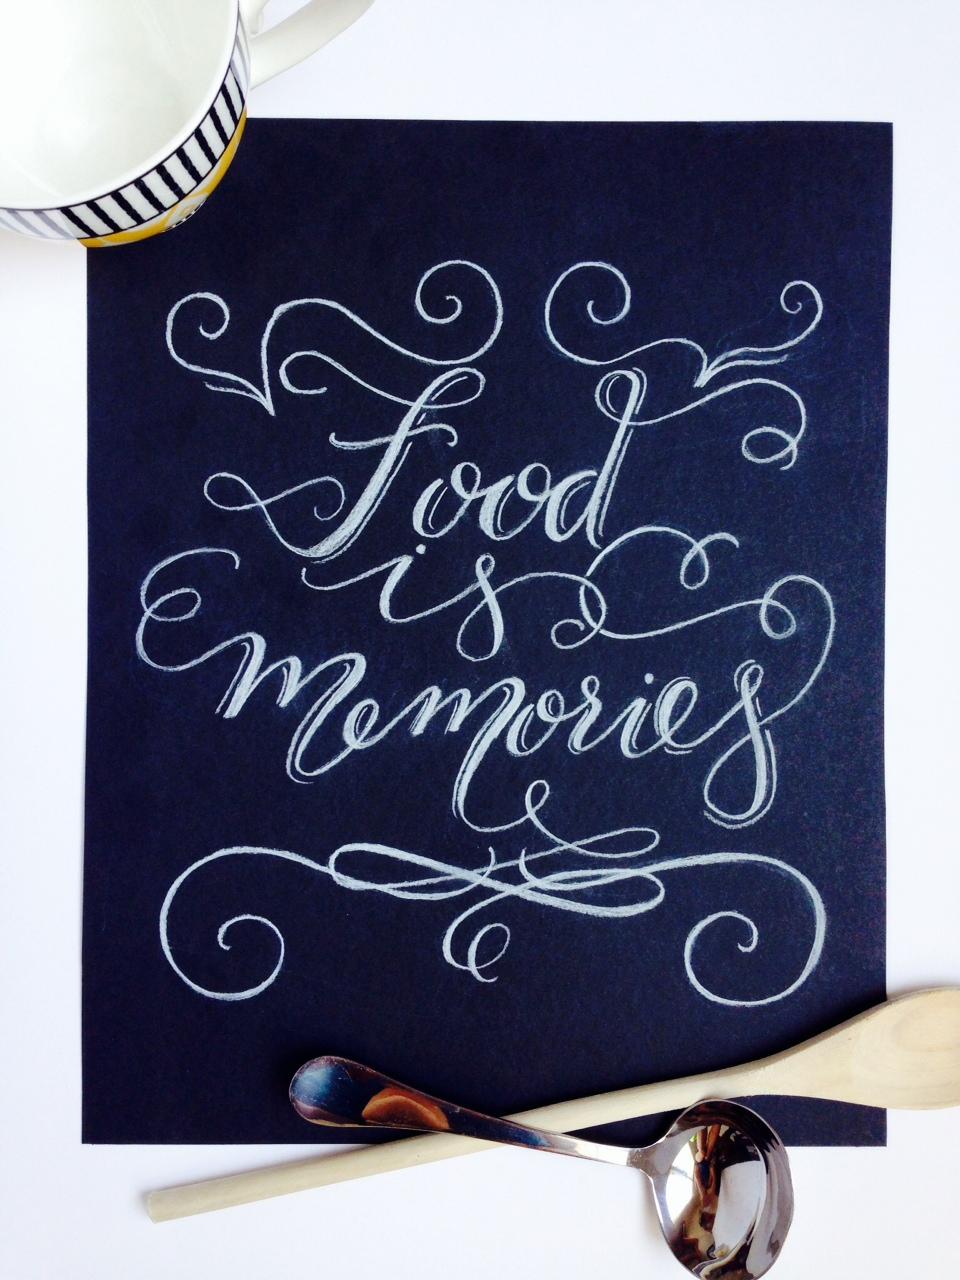 Food essays and memories